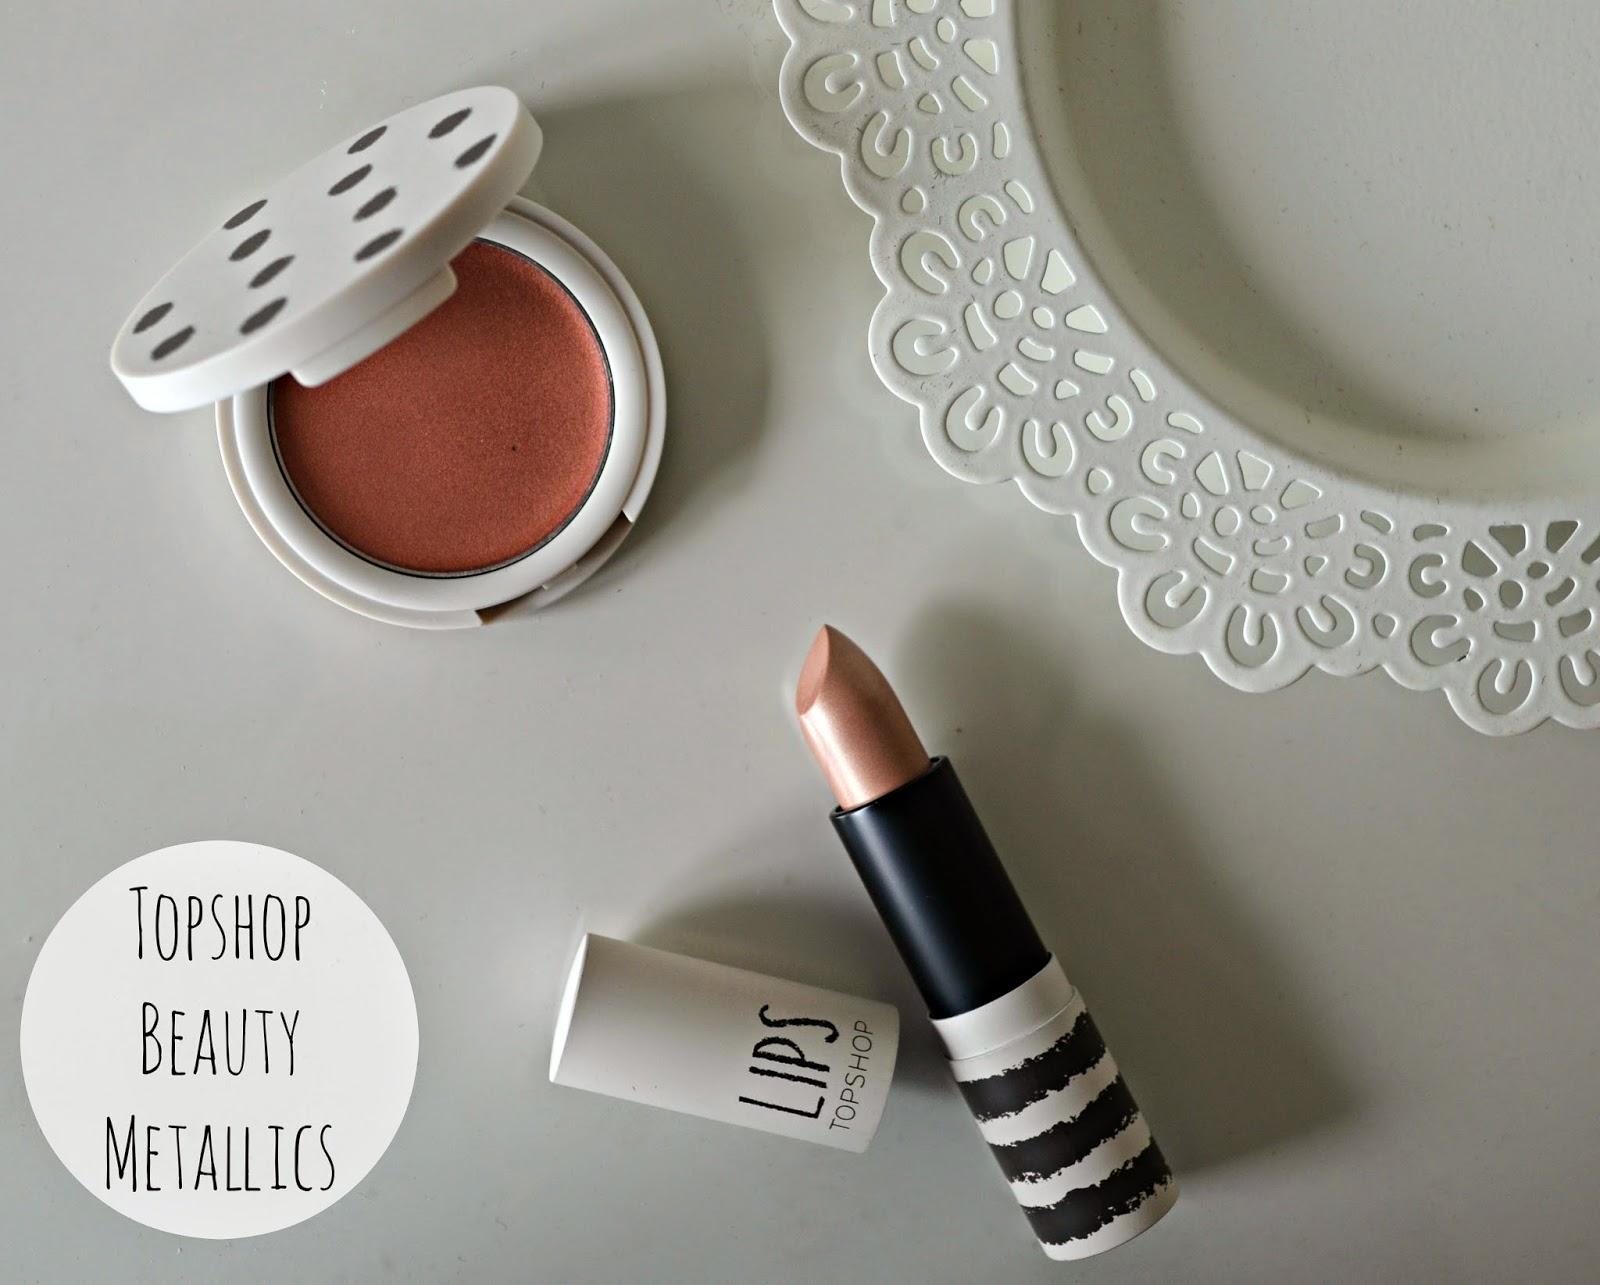 Topshop beauty: Molten Metallics